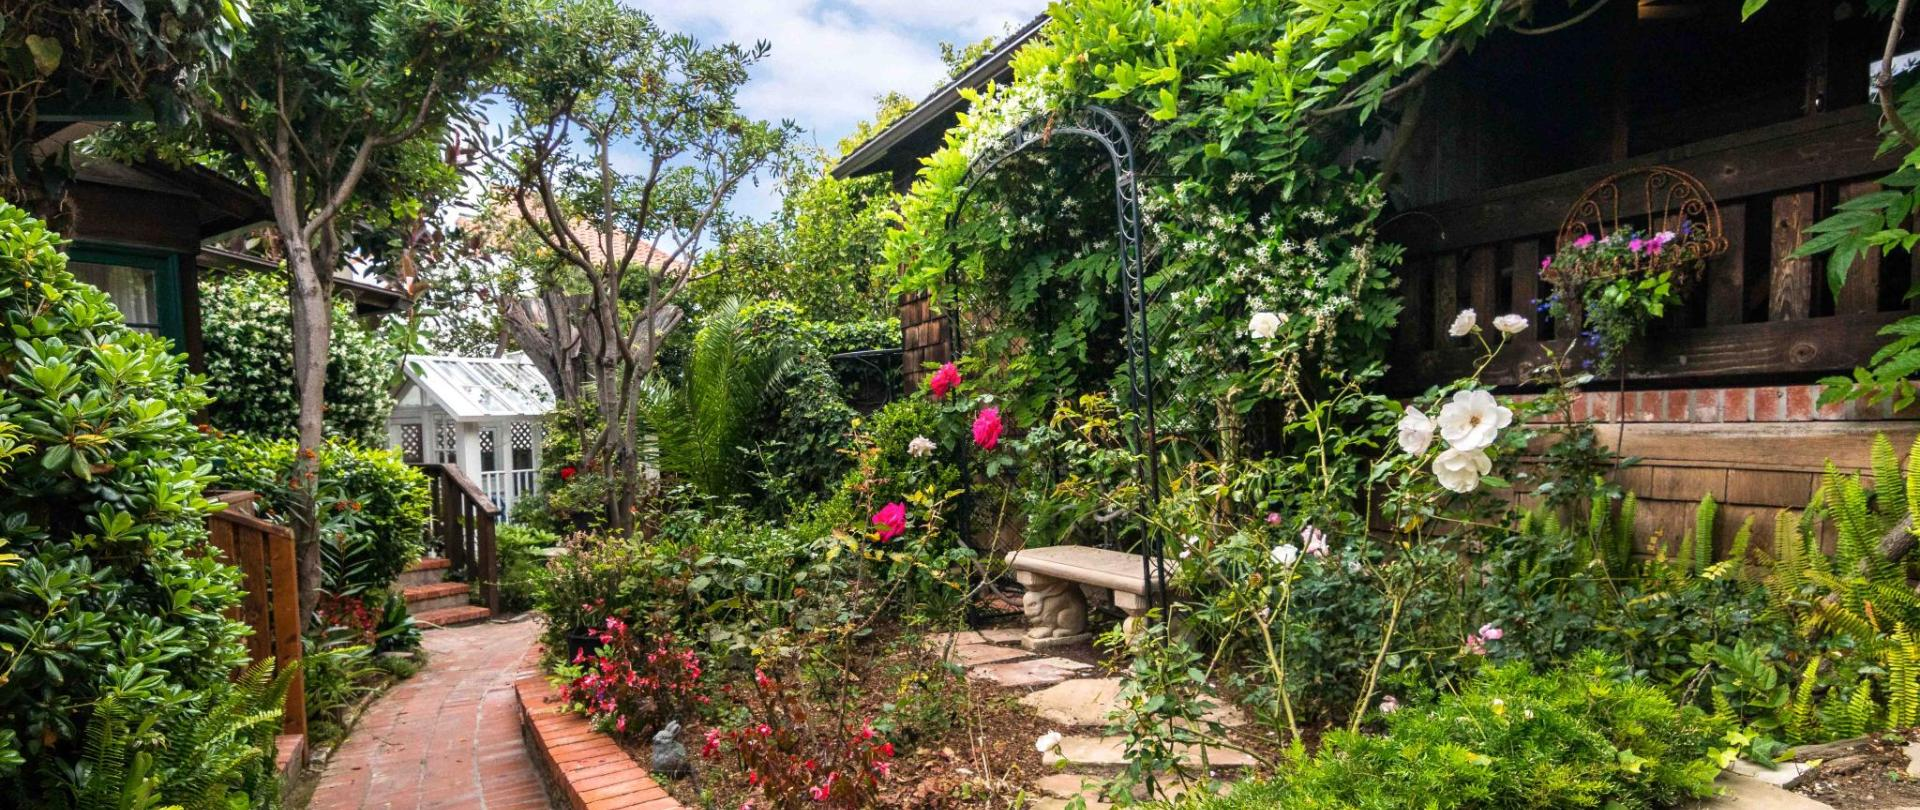 Garden Path 3.jpg